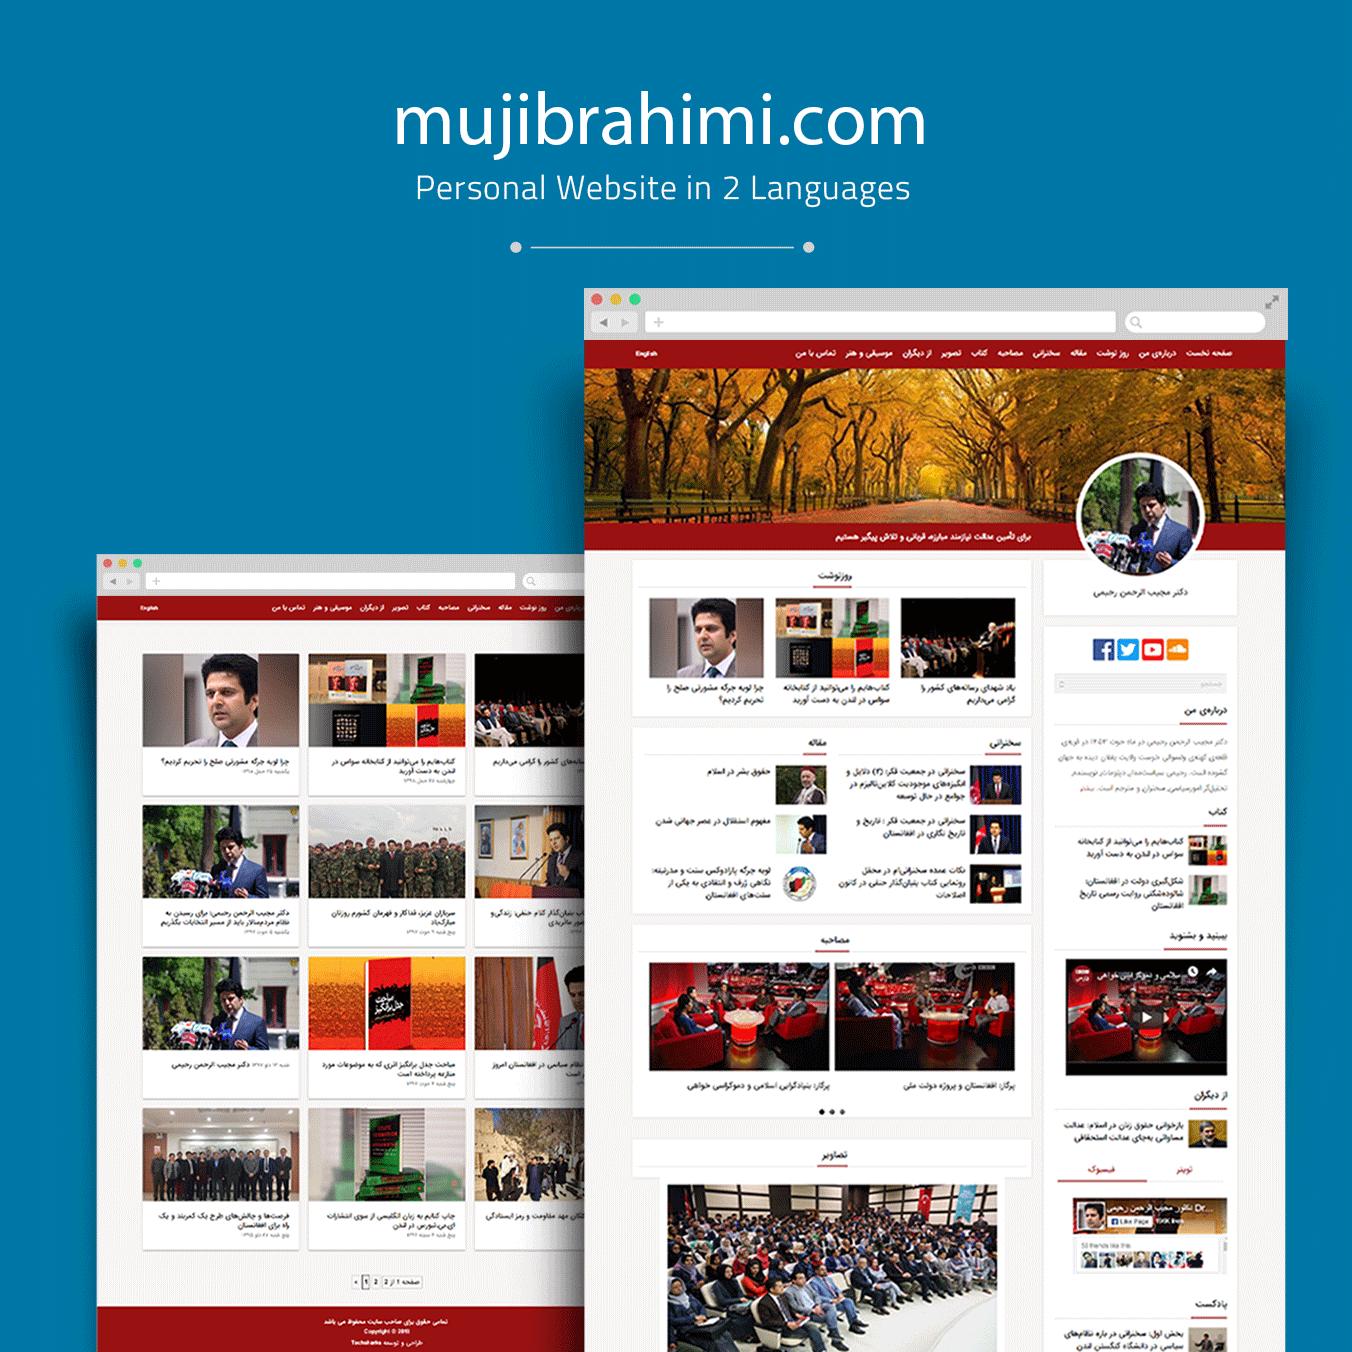 Mujibrahimi.com – Personal Website